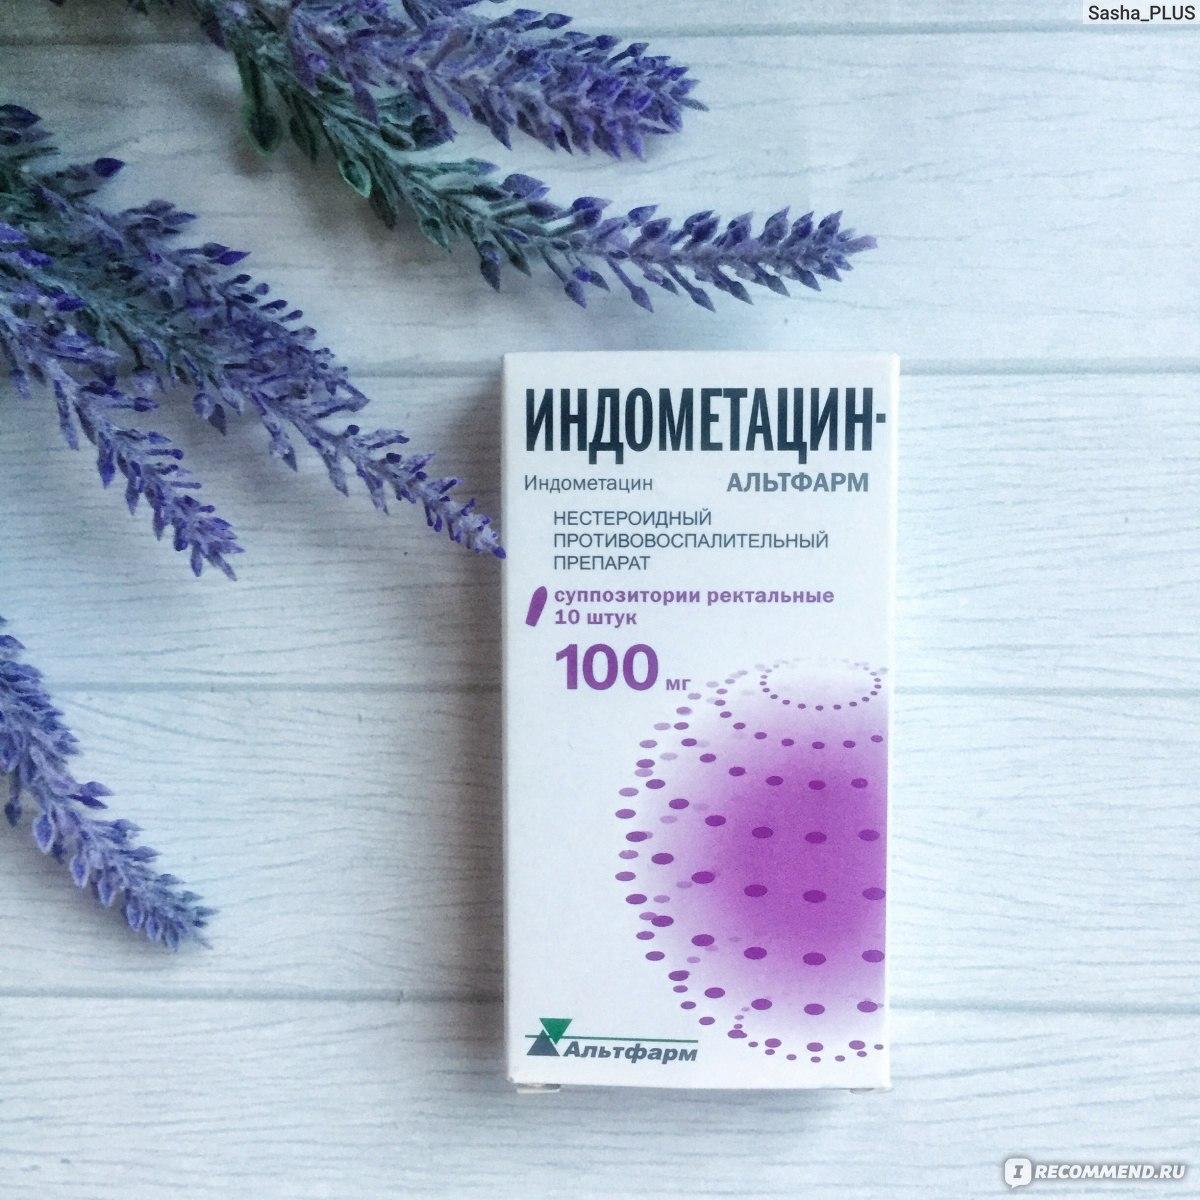 Индометацин софарма мазь инструкция по применению, цена, аналоги.